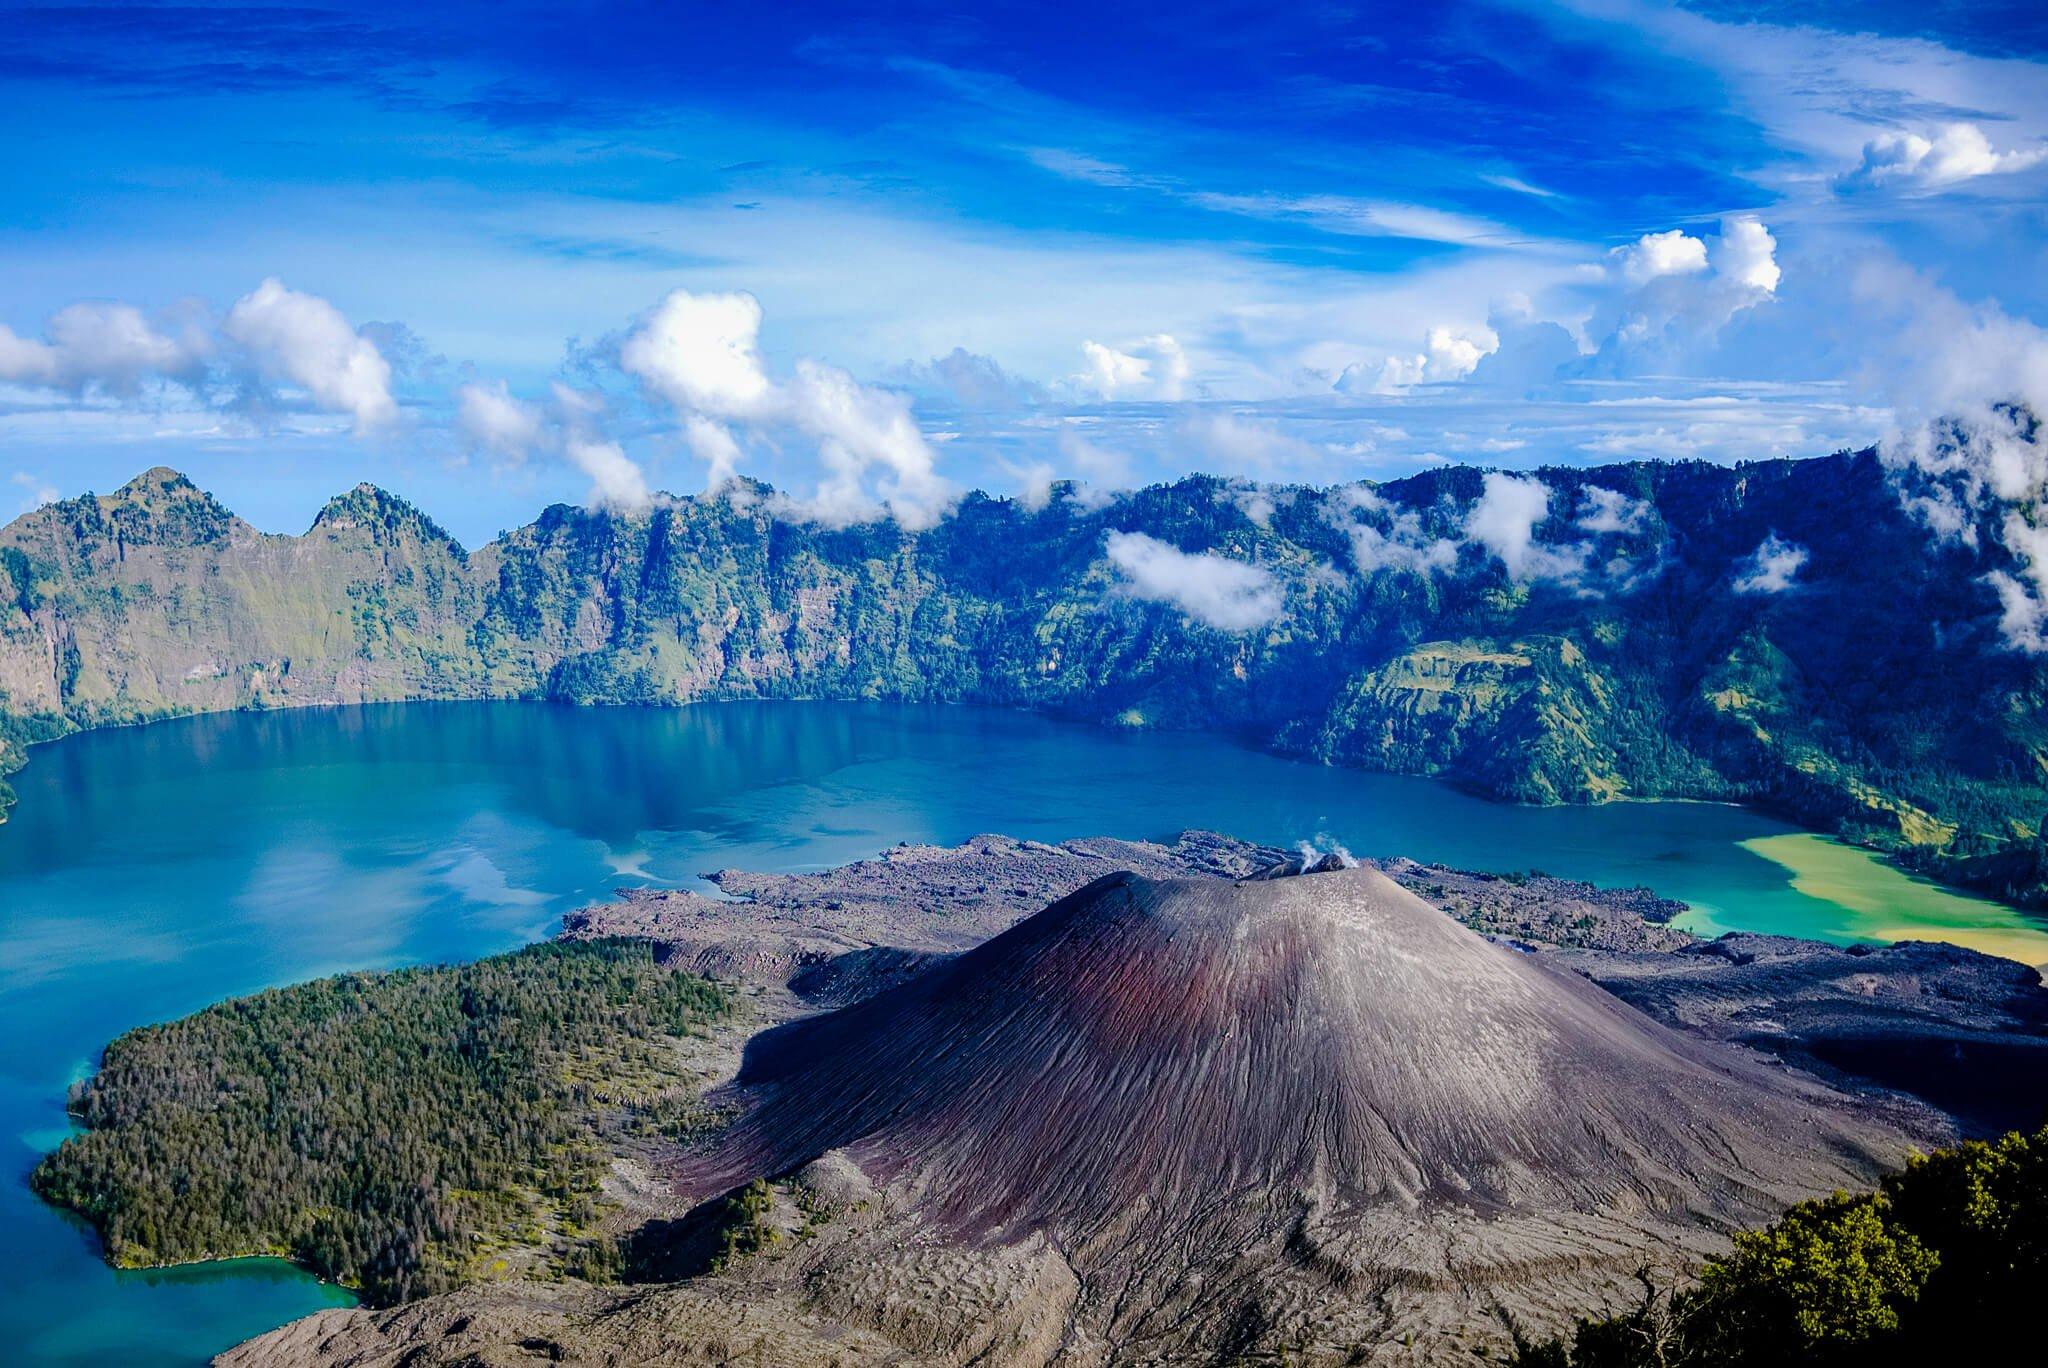 Mt Rinjani lombok indonesia - a travel bucket list experience